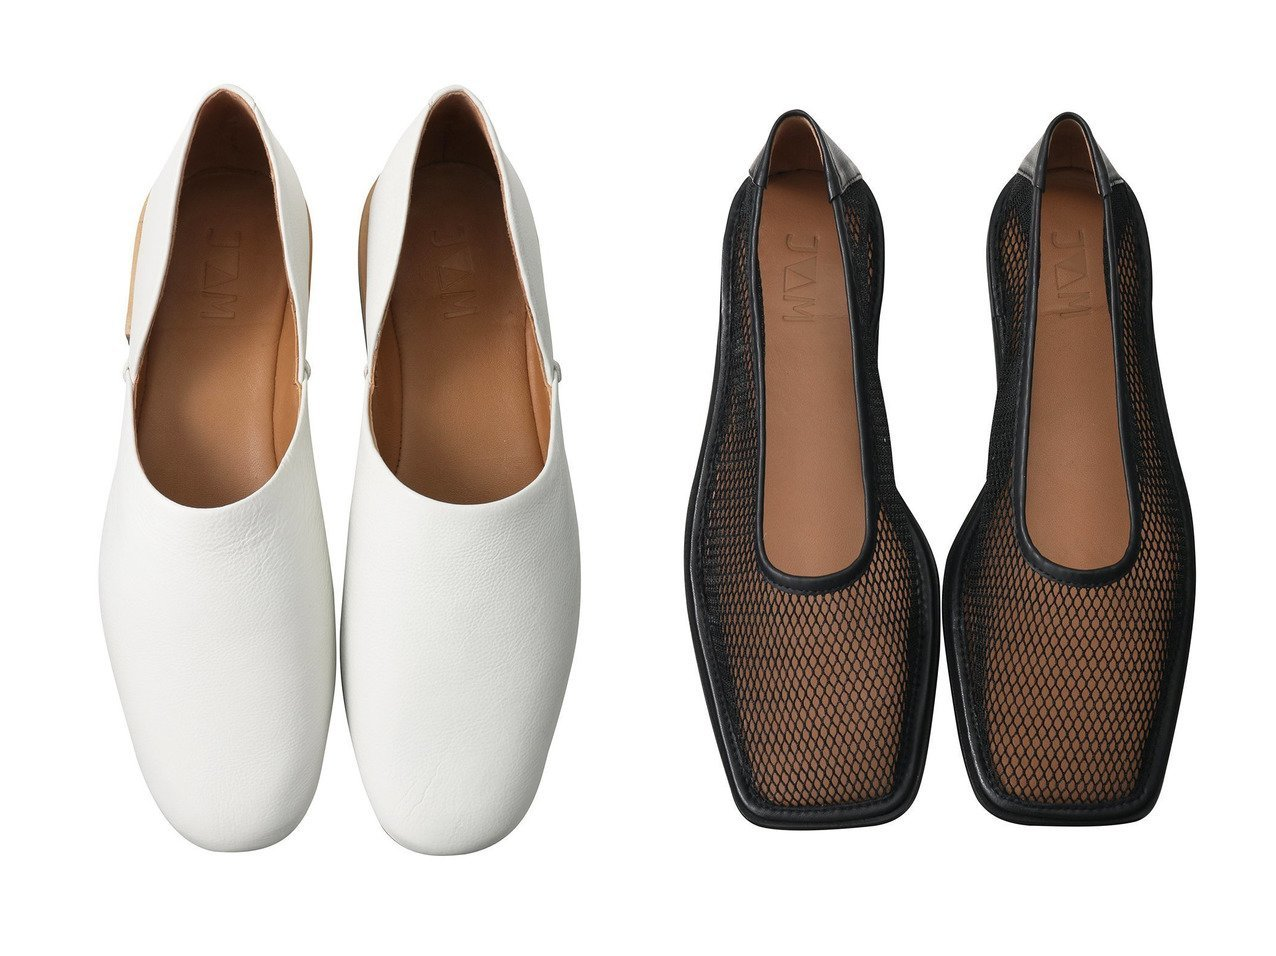 【JVAM/ジェーヴィエーエム】のSALAI スクエアトゥメッシュフラットシューズ&LEN セパレートフラットシューズ 【シューズ・靴】おすすめ!人気、トレンド・レディースファッションの通販 おすすめで人気の流行・トレンド、ファッションの通販商品 メンズファッション・キッズファッション・インテリア・家具・レディースファッション・服の通販 founy(ファニー) https://founy.com/ ファッション Fashion レディースファッション WOMEN なめらか シューズ シンプル スタイリッシュ フラット メッシュ リゾート 今季 |ID:crp329100000036722